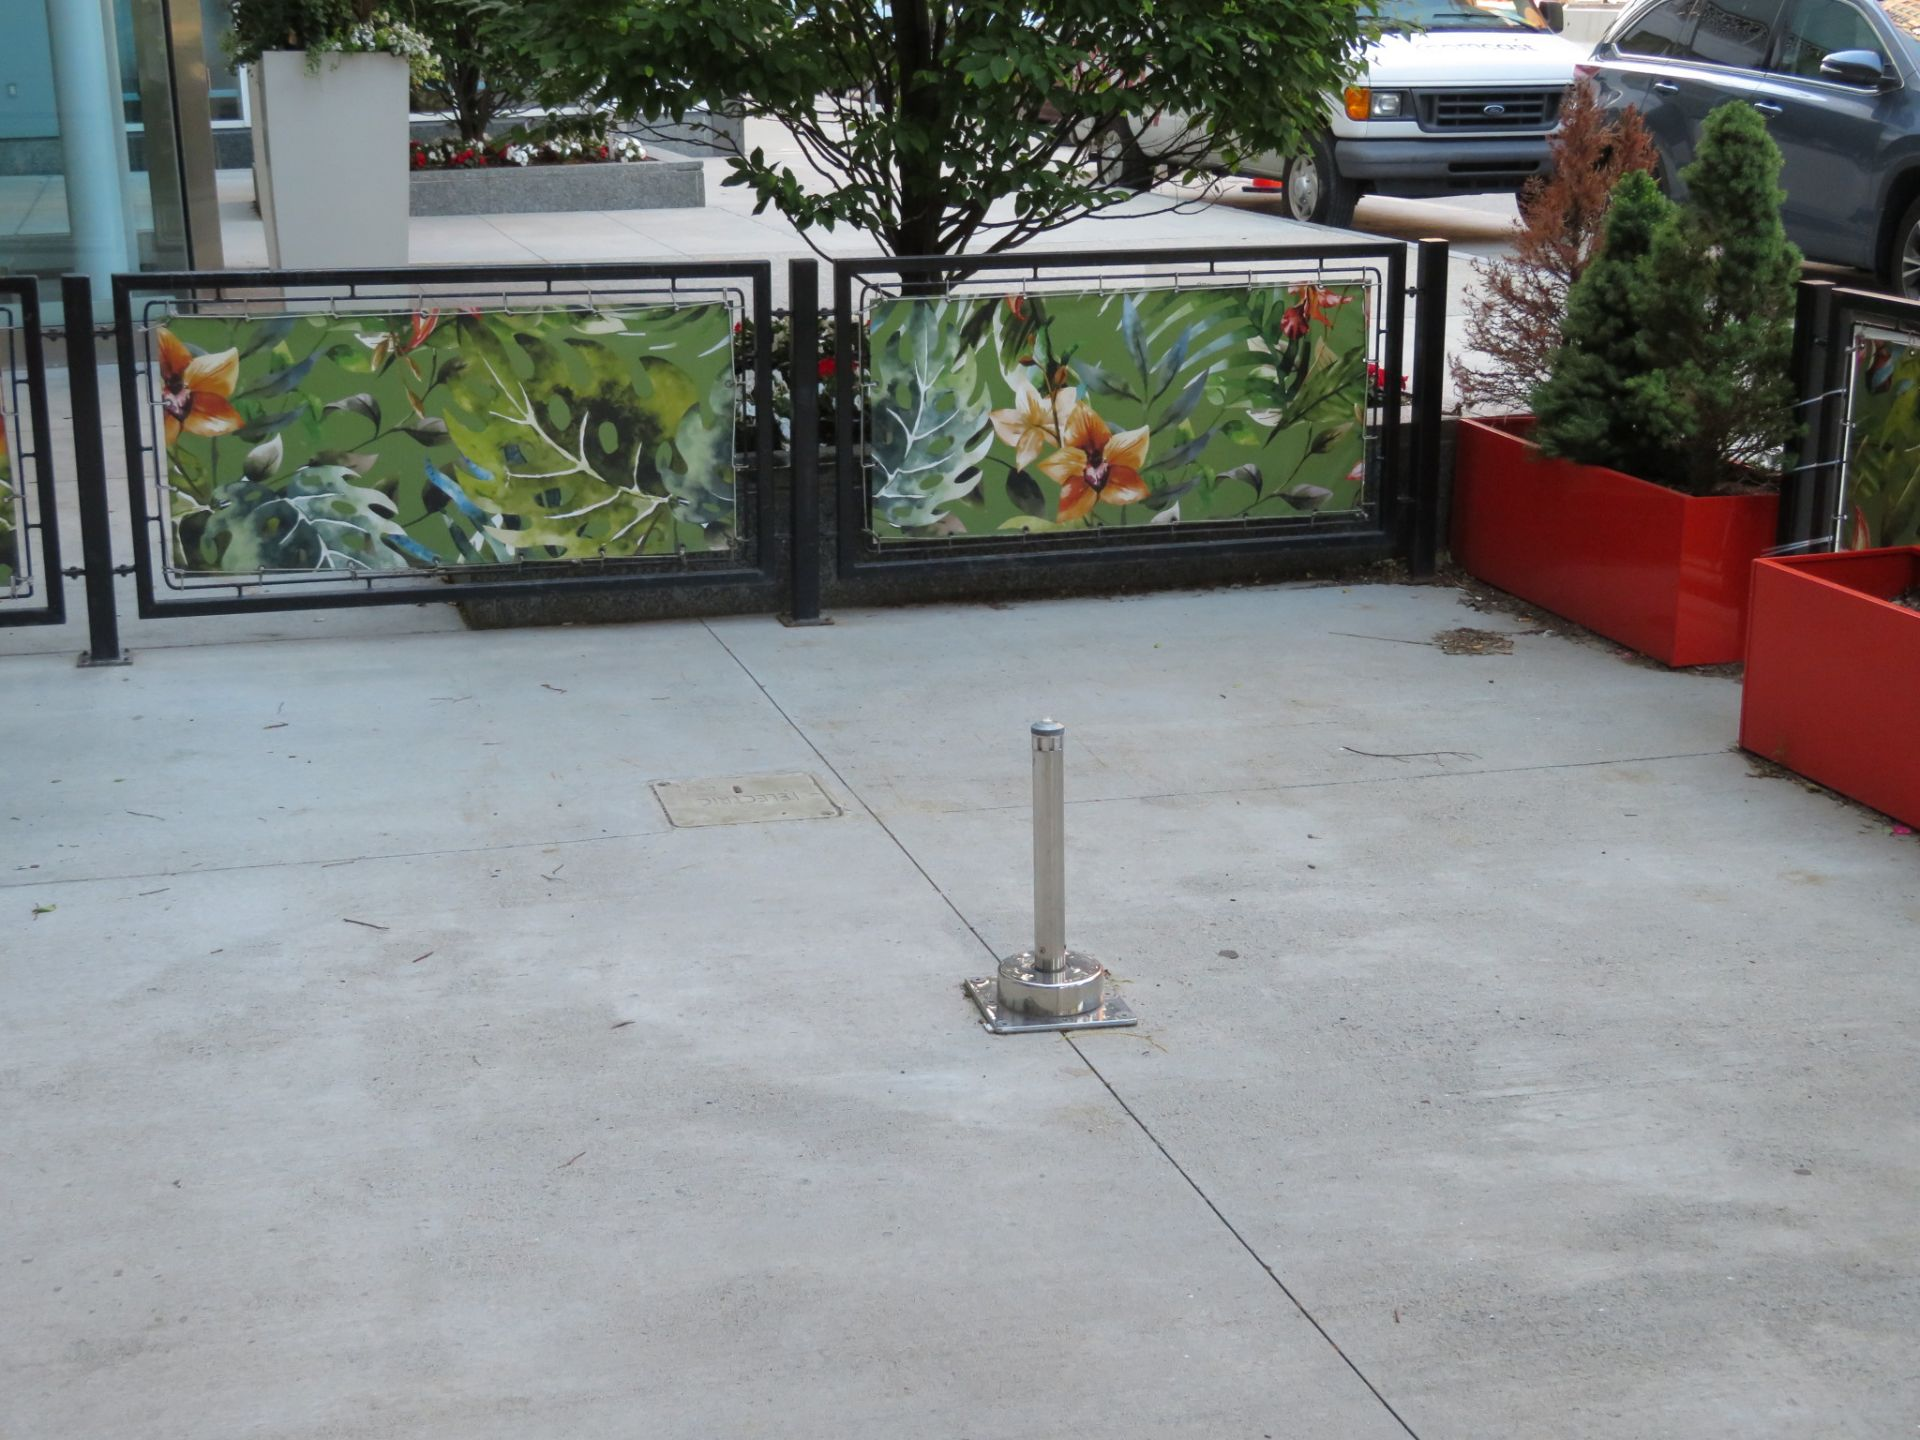 Lot 40 - (Lot) Patio Railings & Planters w/ Iron Gate